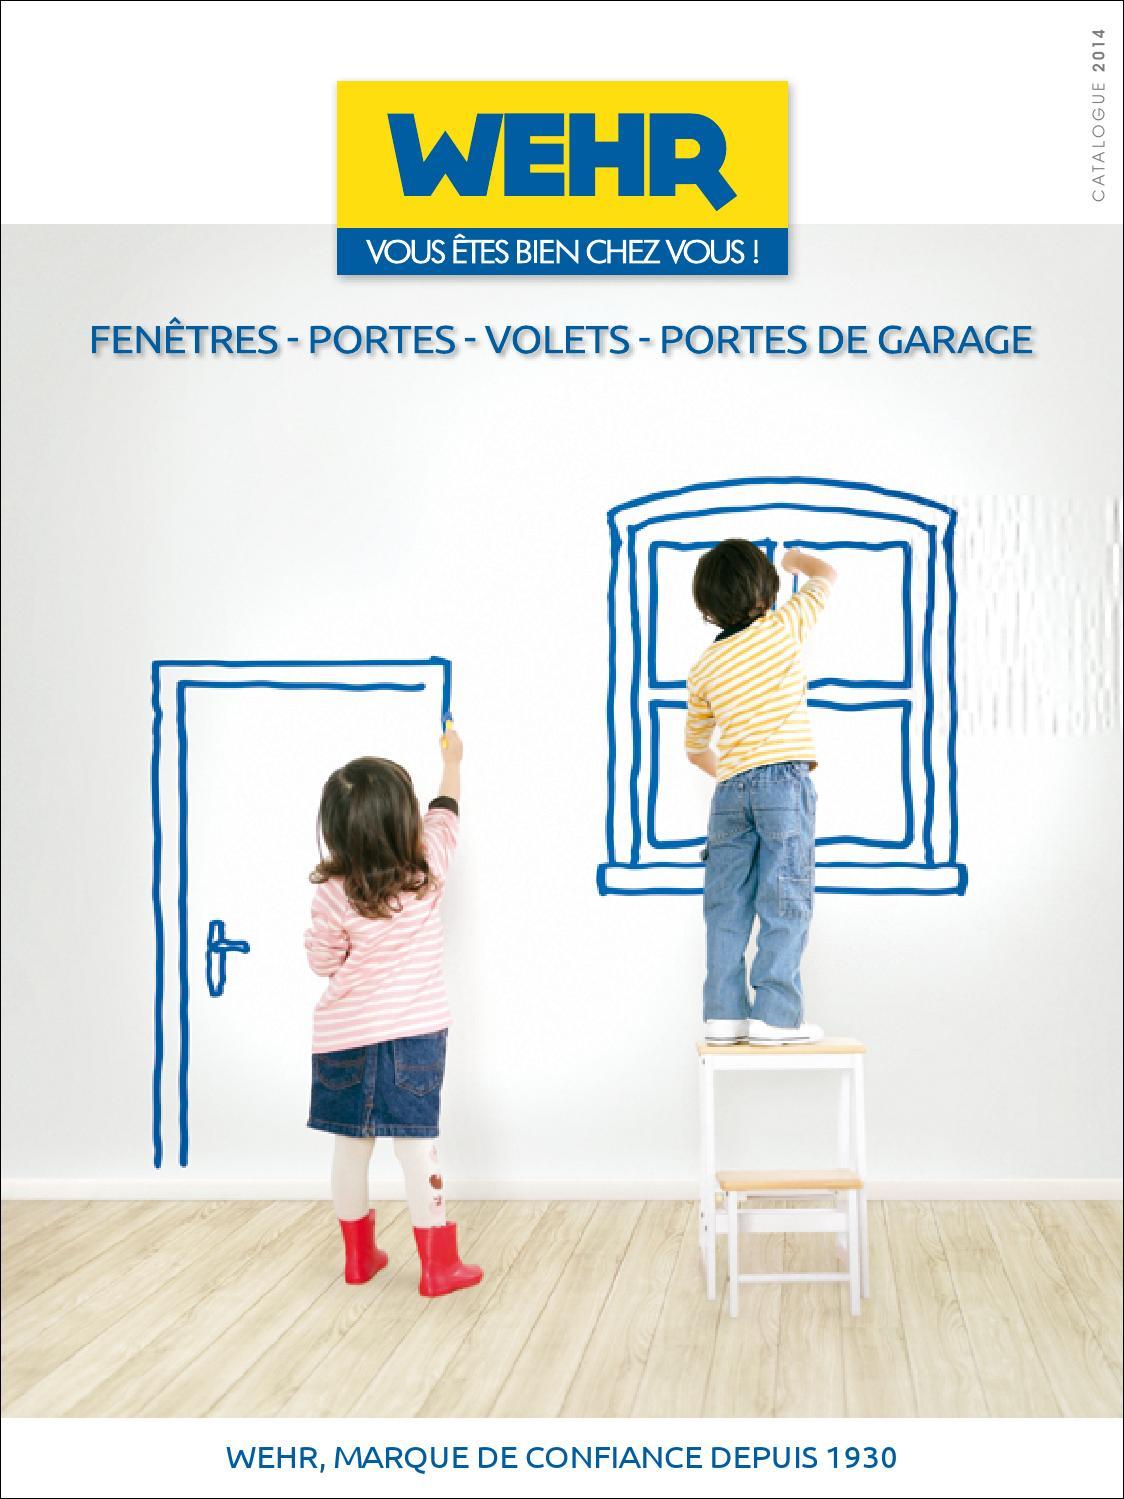 Wehr catalogue 2014 portes fen tres volets by wehr issuu for Fenetre wehr